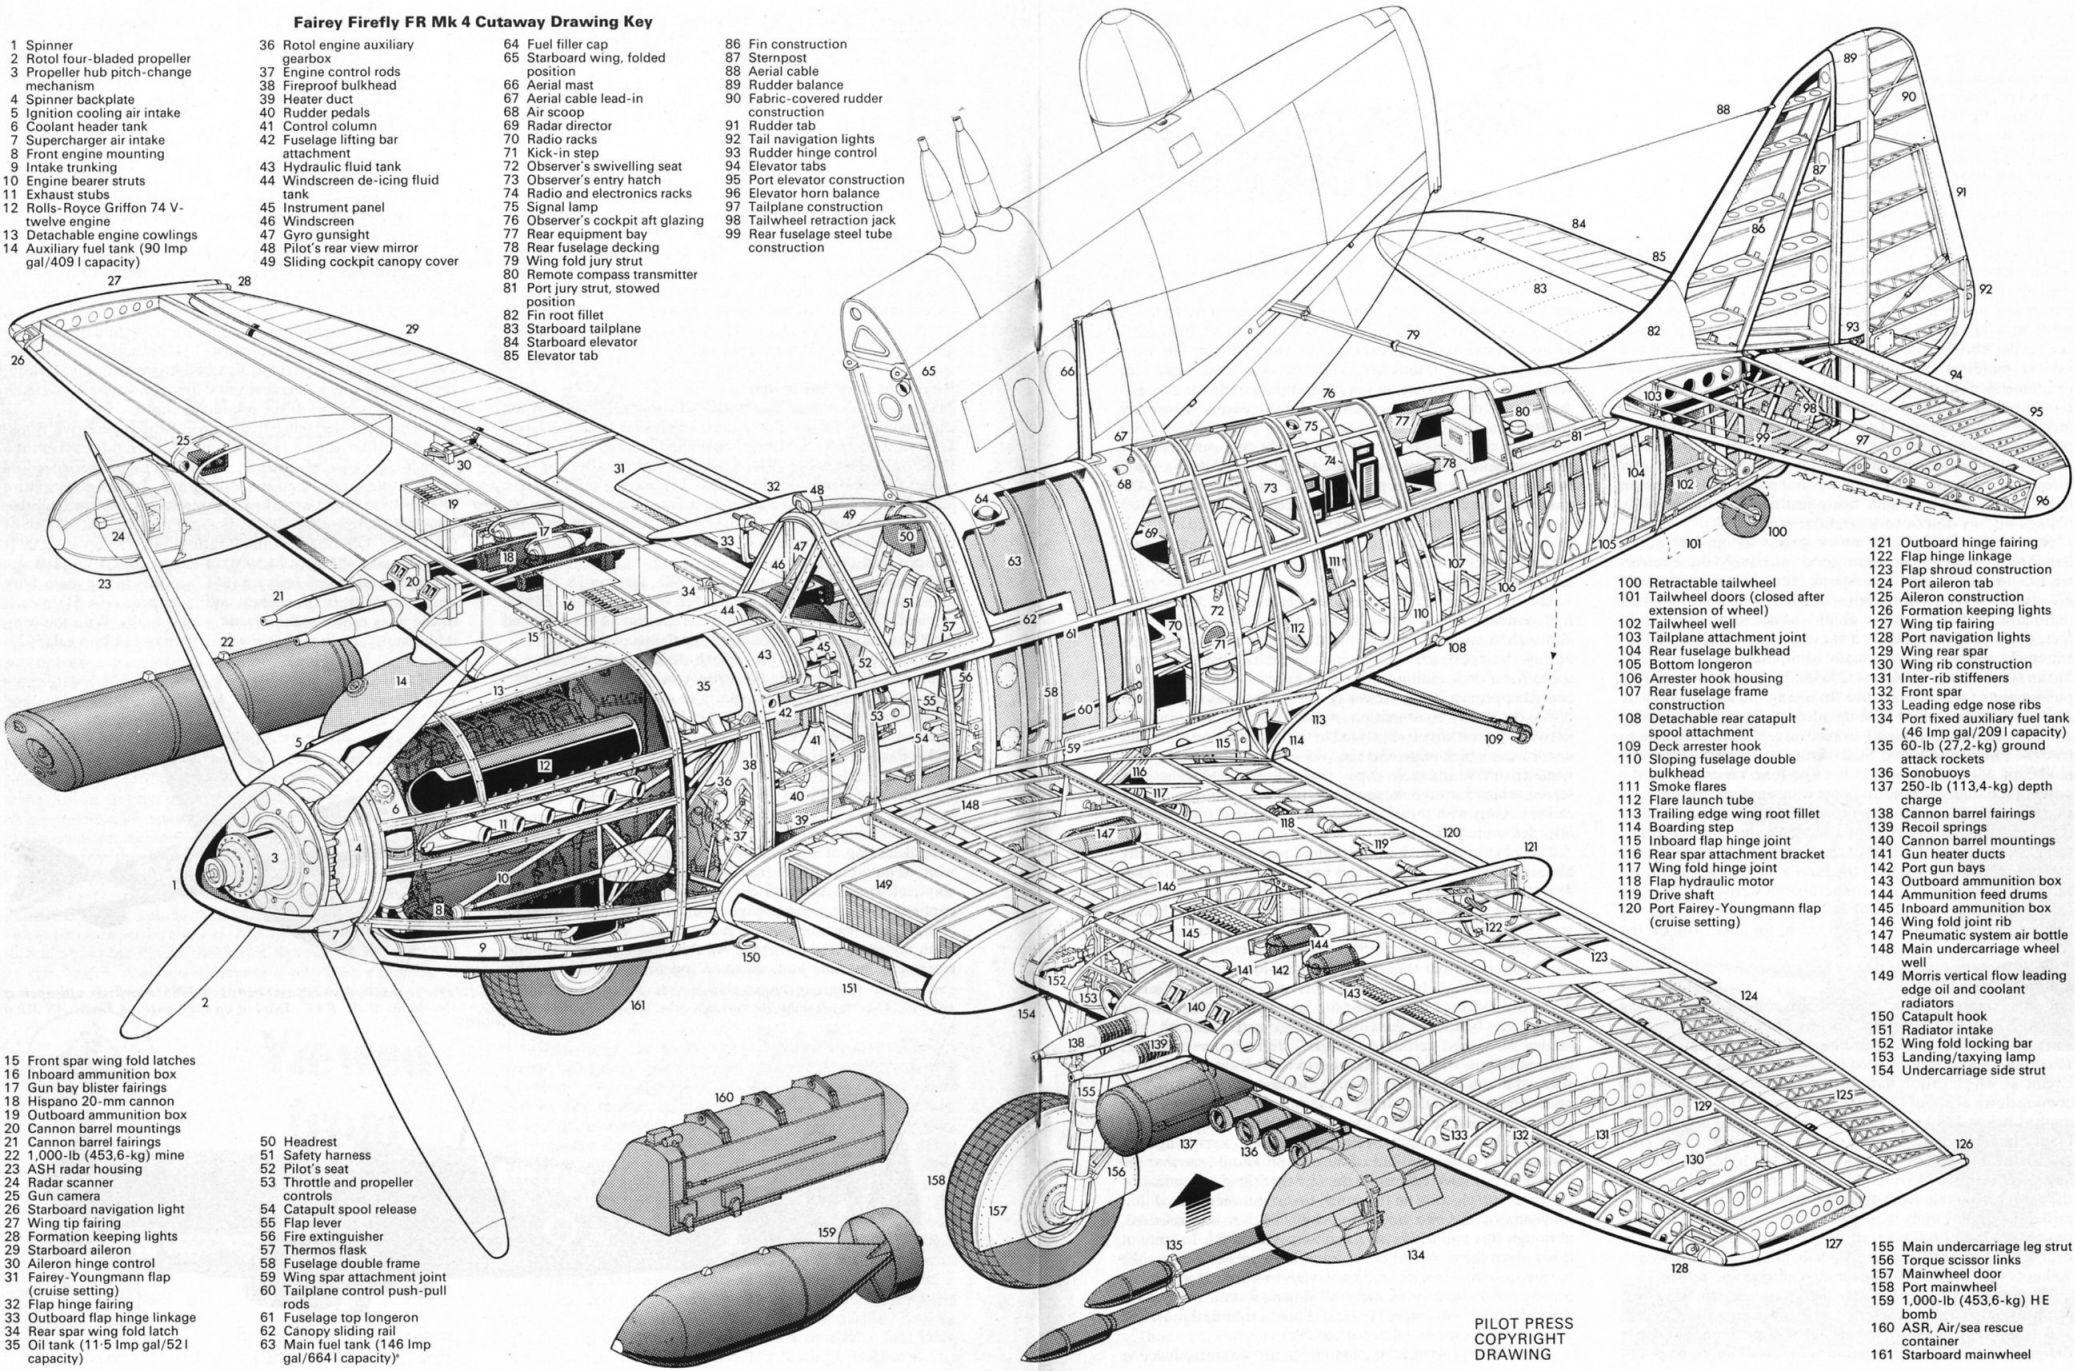 Fairey-firefly-cutaway-drawing